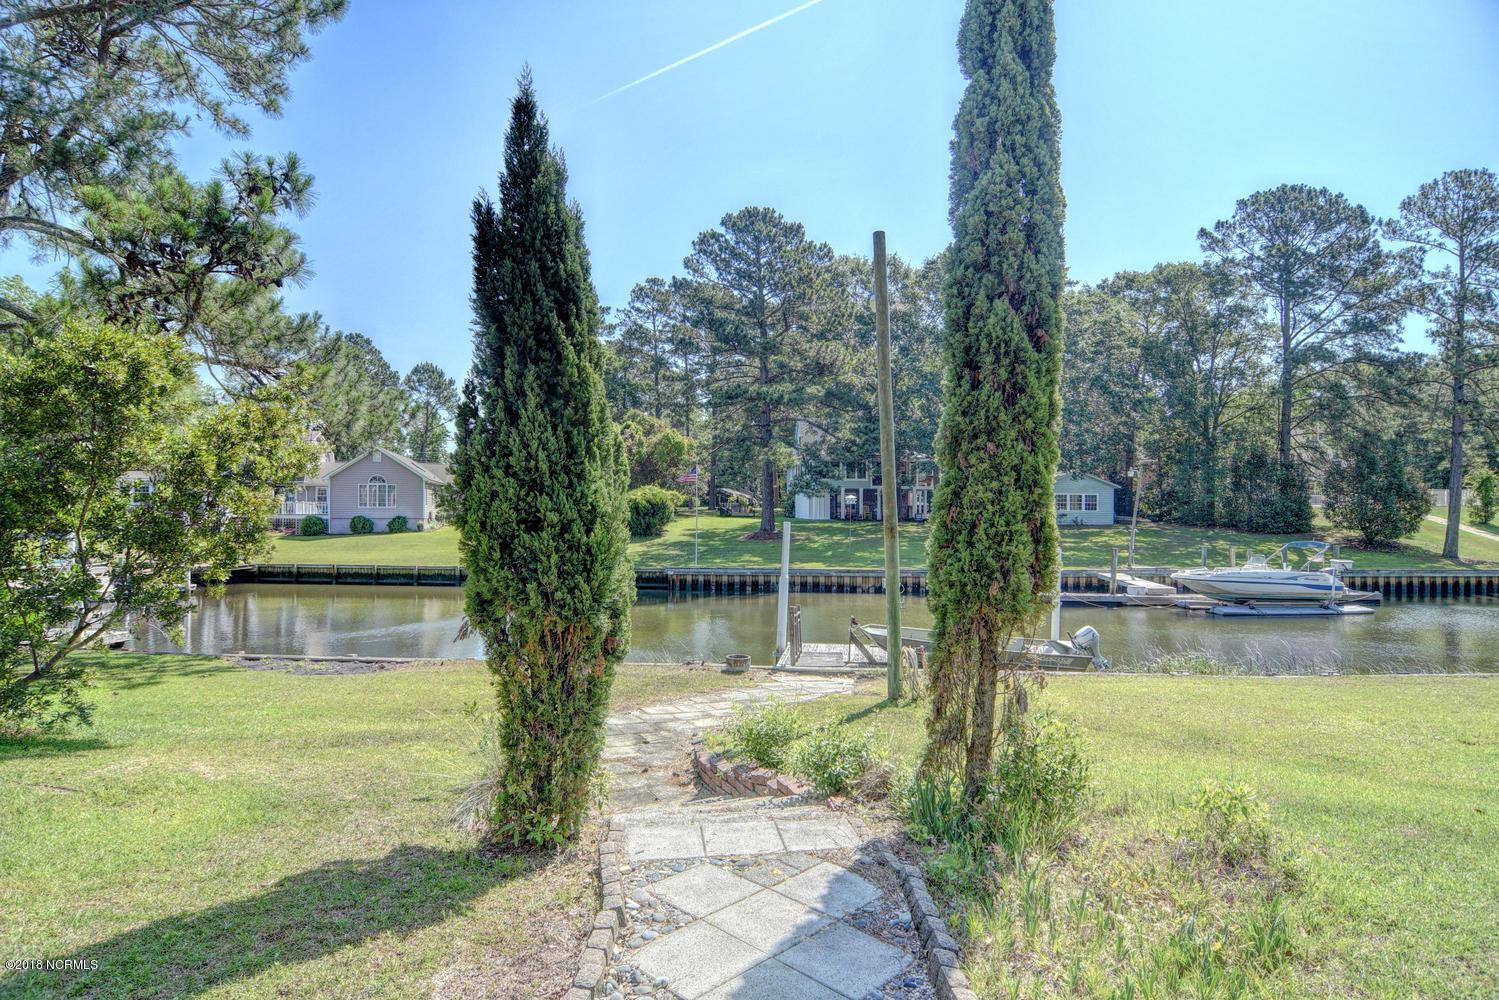 119 White Heron Cove Road, Hampstead, North Carolina, 3 Bedrooms Bedrooms, 12 Rooms Rooms,3 BathroomsBathrooms,Single family residence,For sale,White Heron Cove,100105505